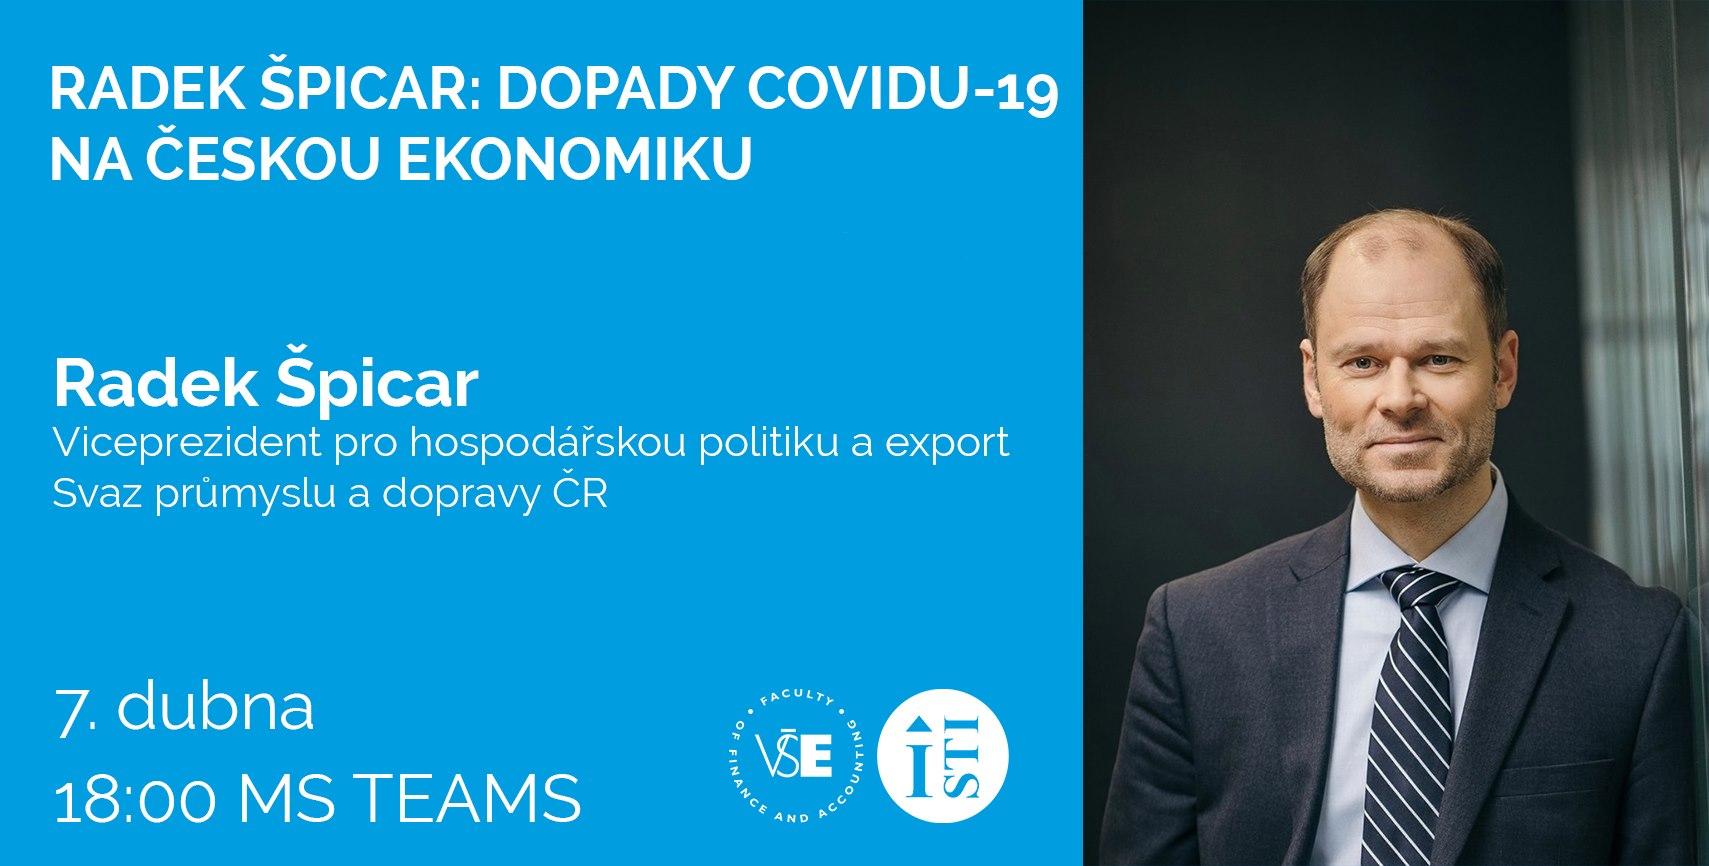 Radek Špicar: Dopady COVID-19 na českou ekonomiku